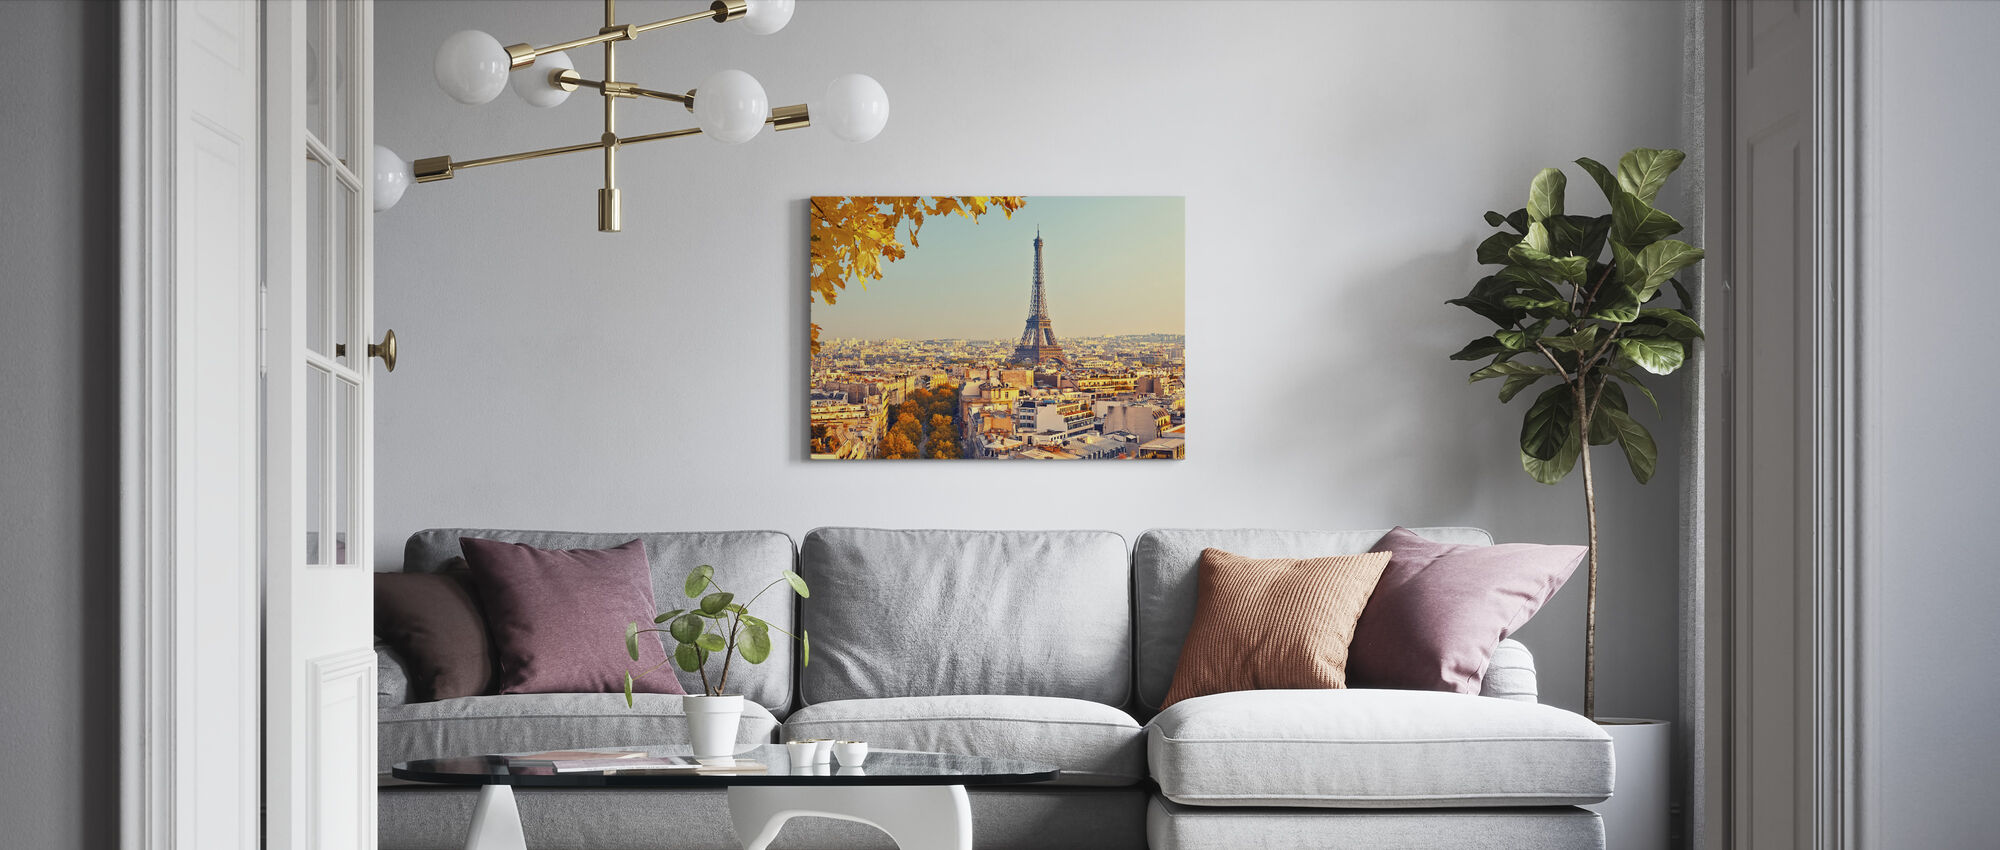 Eiffeltårnet, høstutsikt - Lerretsbilde - Stue